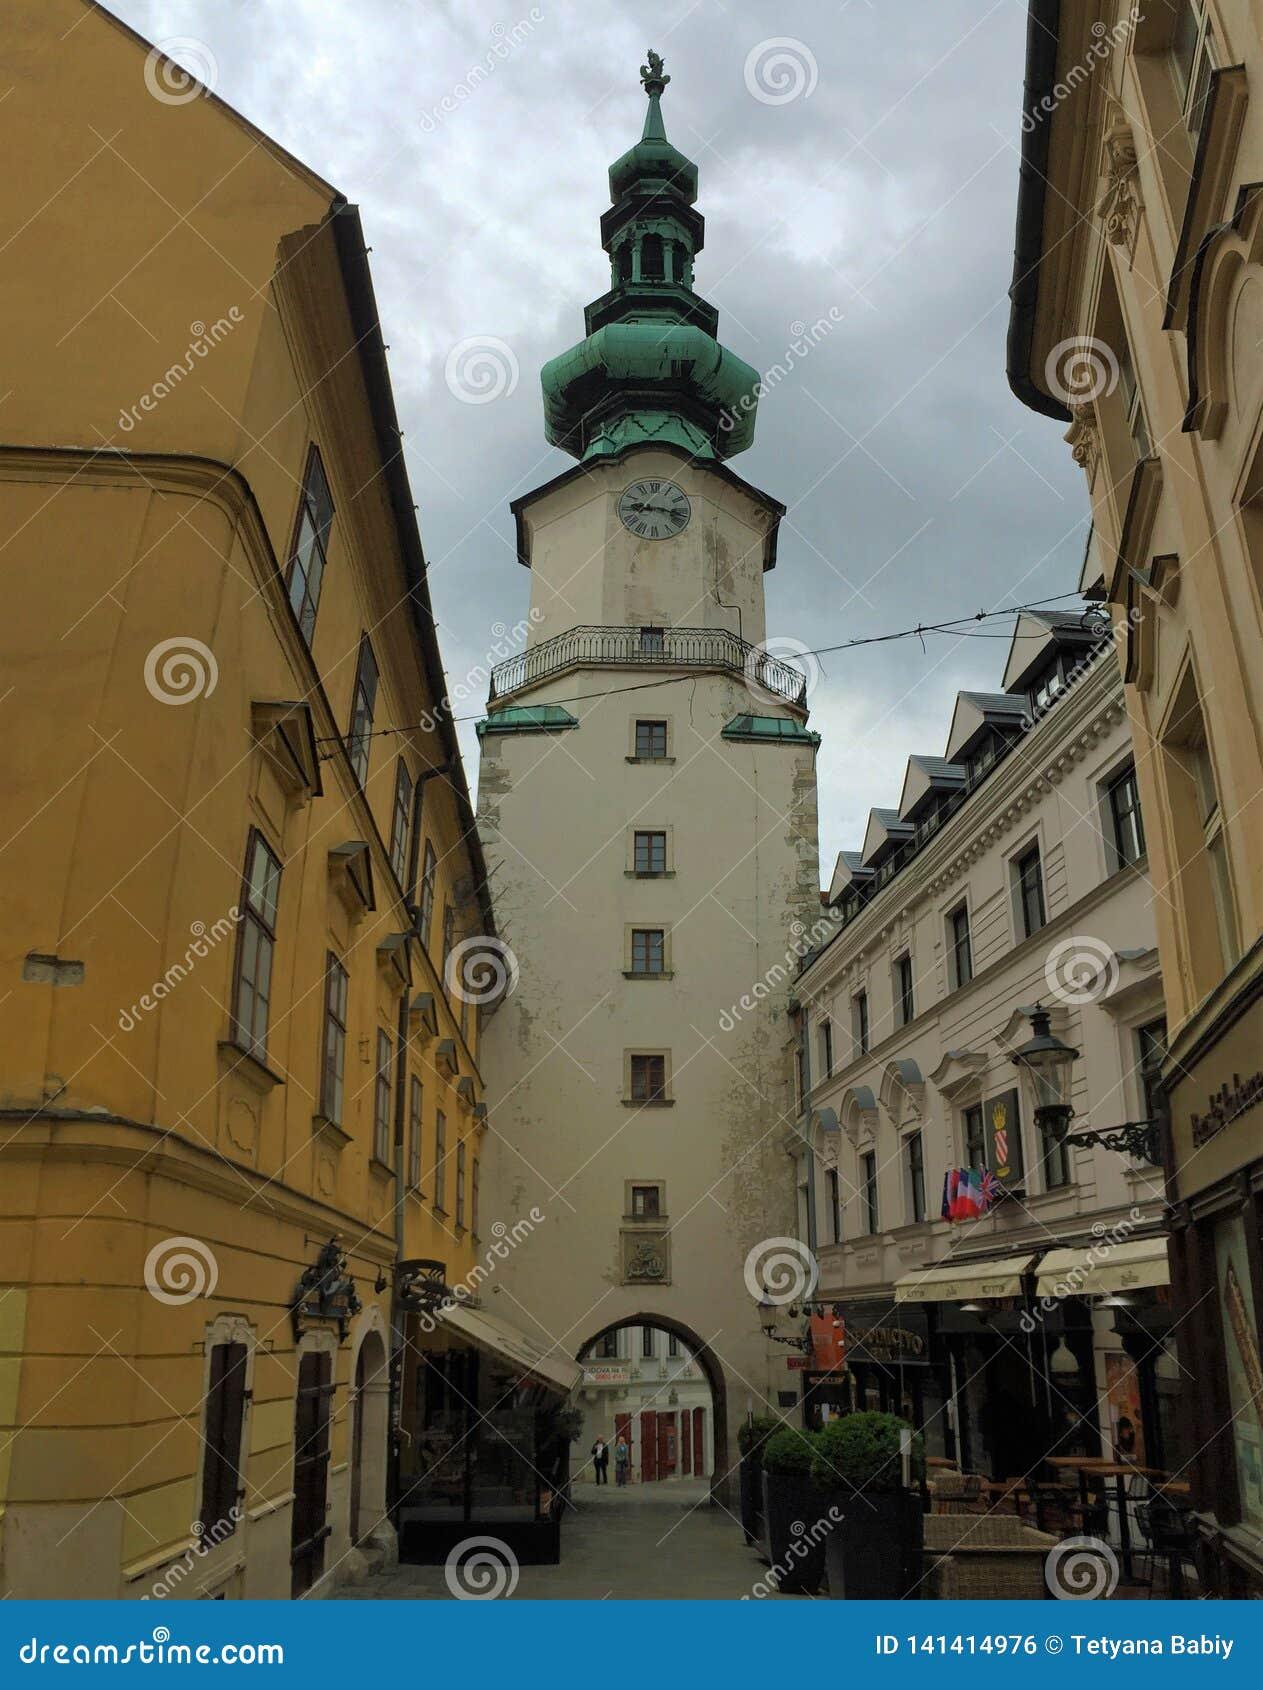 Streets of Bratislava, Slovakia -